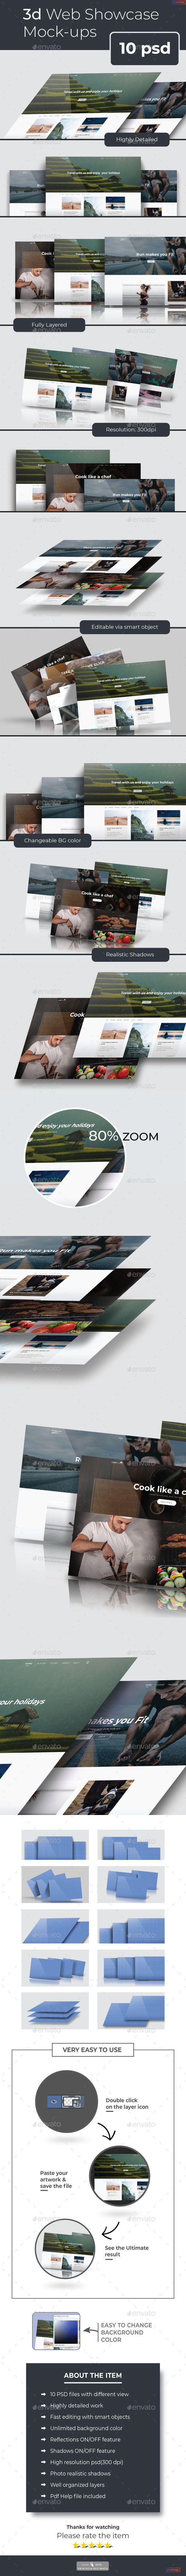 3d Web #Showcase Mockups - Product #Mock-Ups Graphics